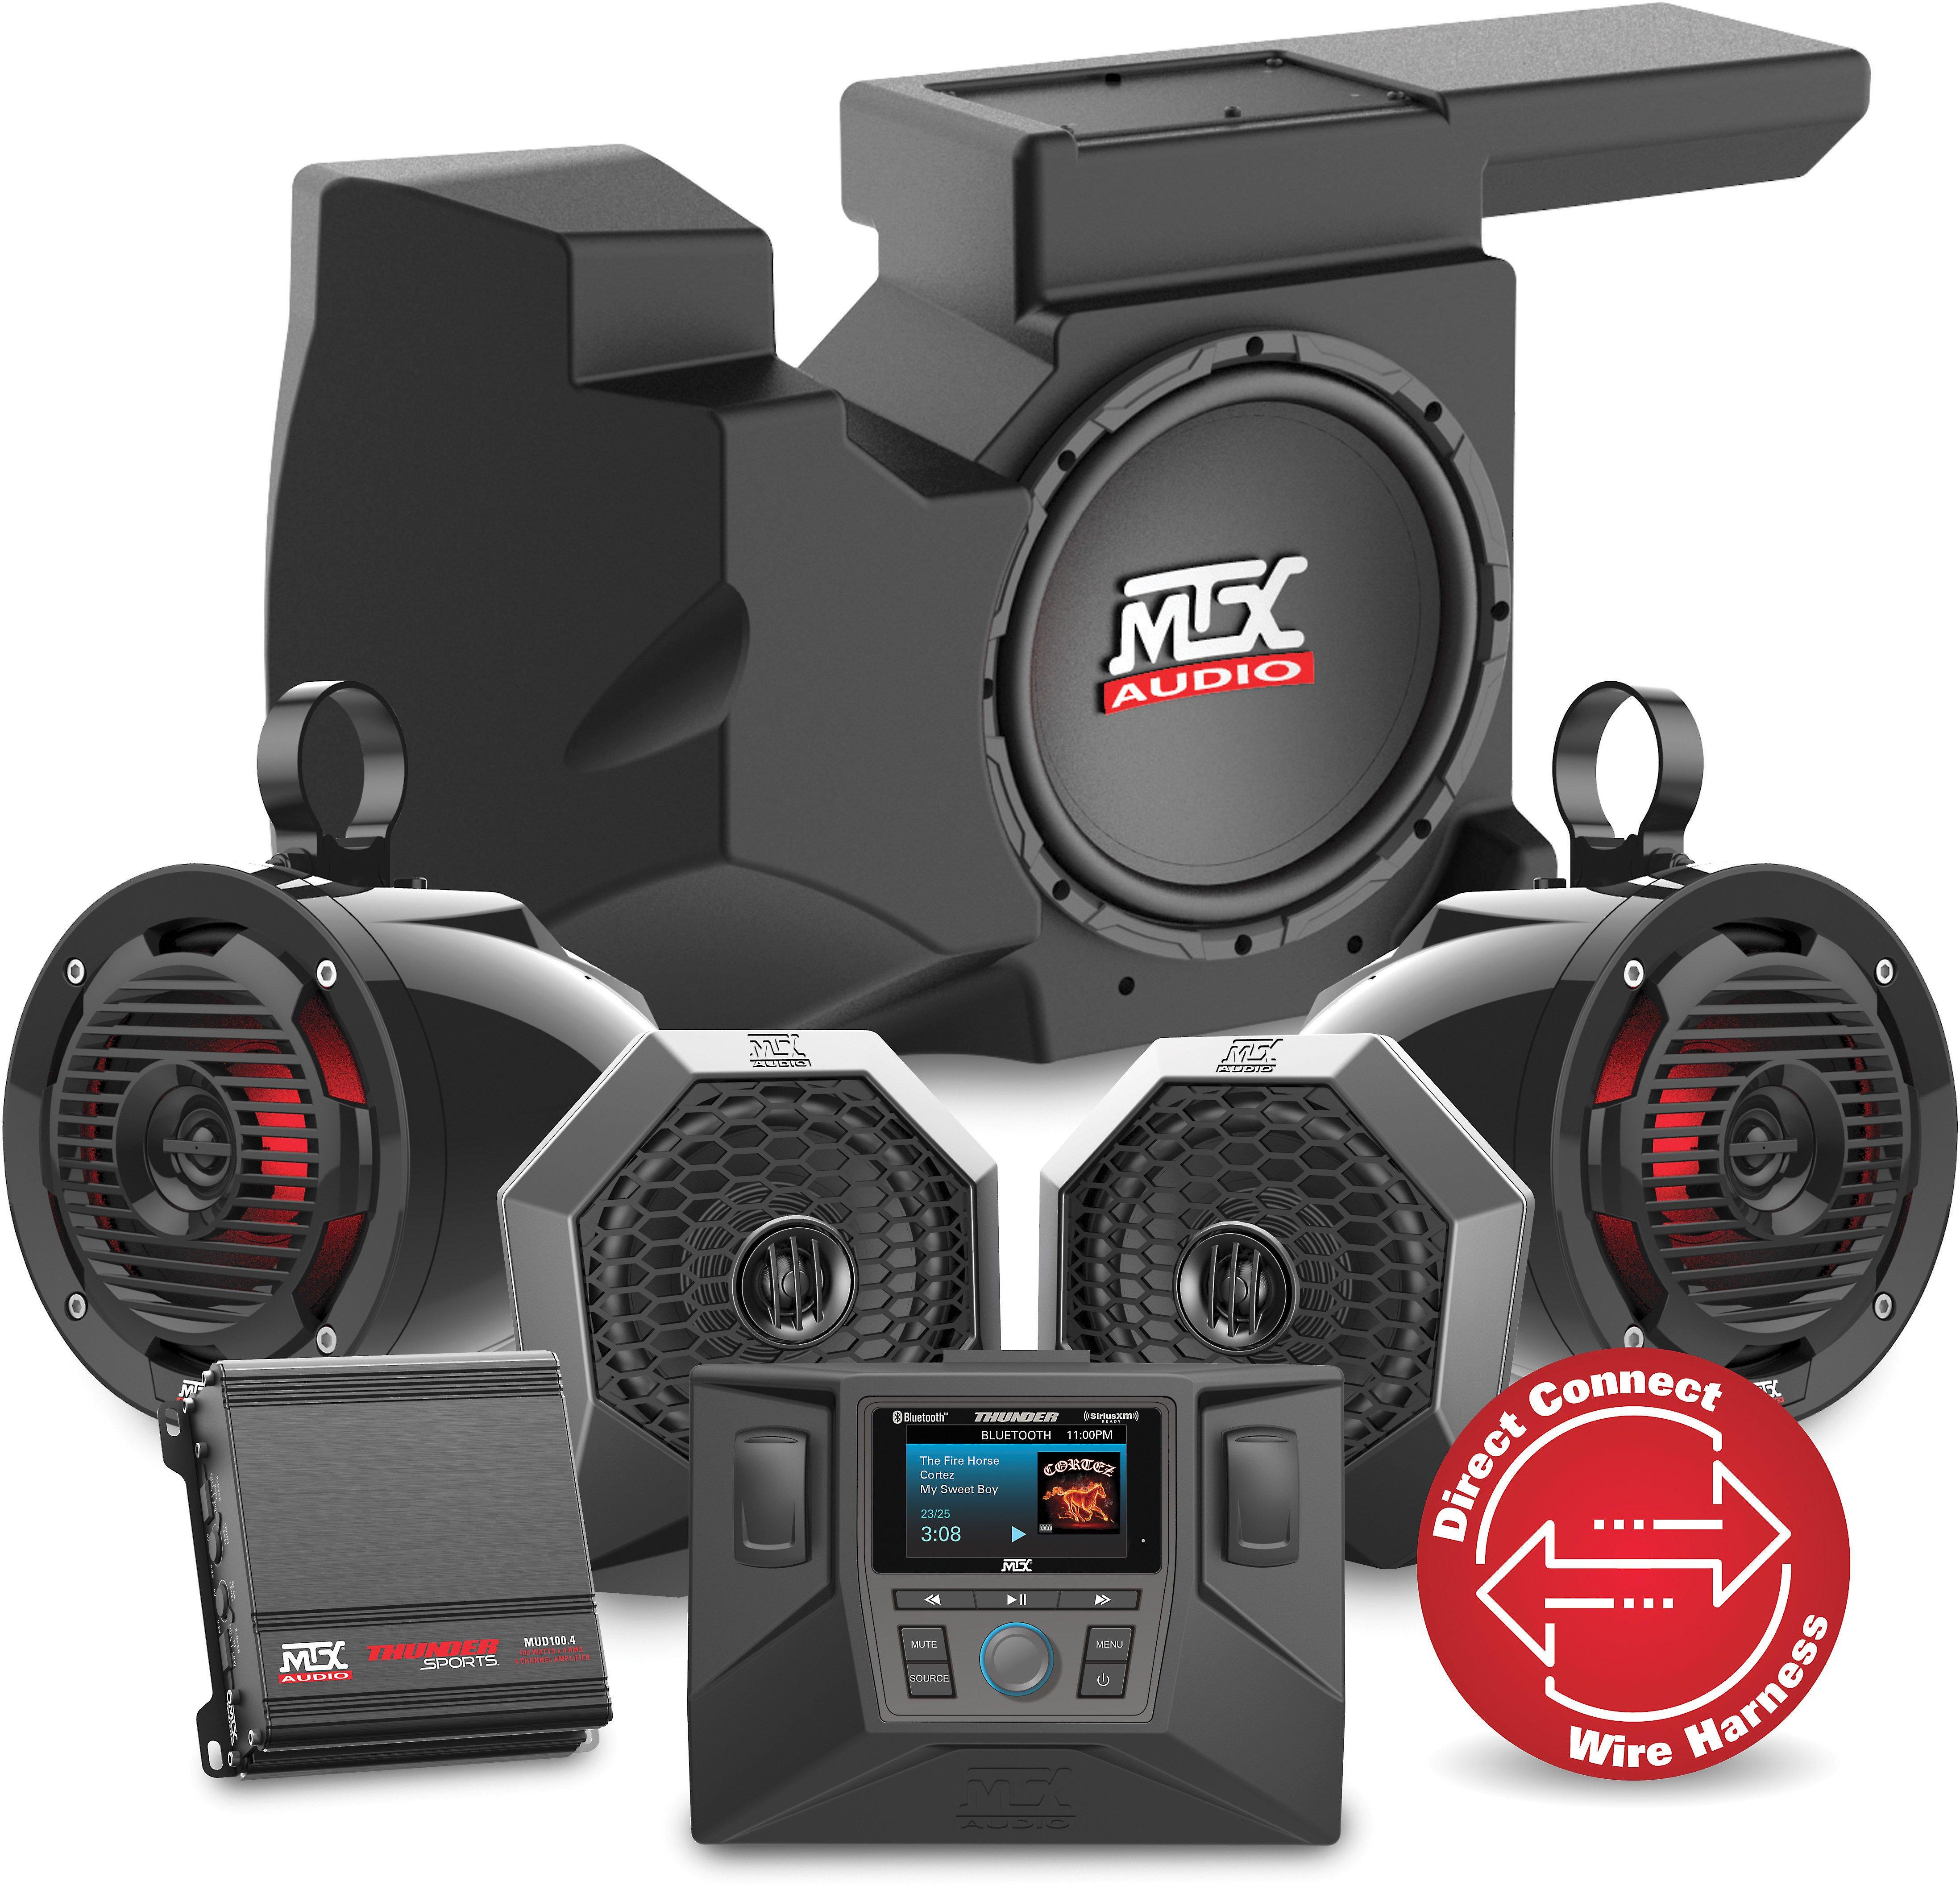 mtx rzrsystem3 audio upgrade kit for select 2014-17 polaris rzr models:  includes digital media receiver, two speaker pods, two bar speakers, amp,